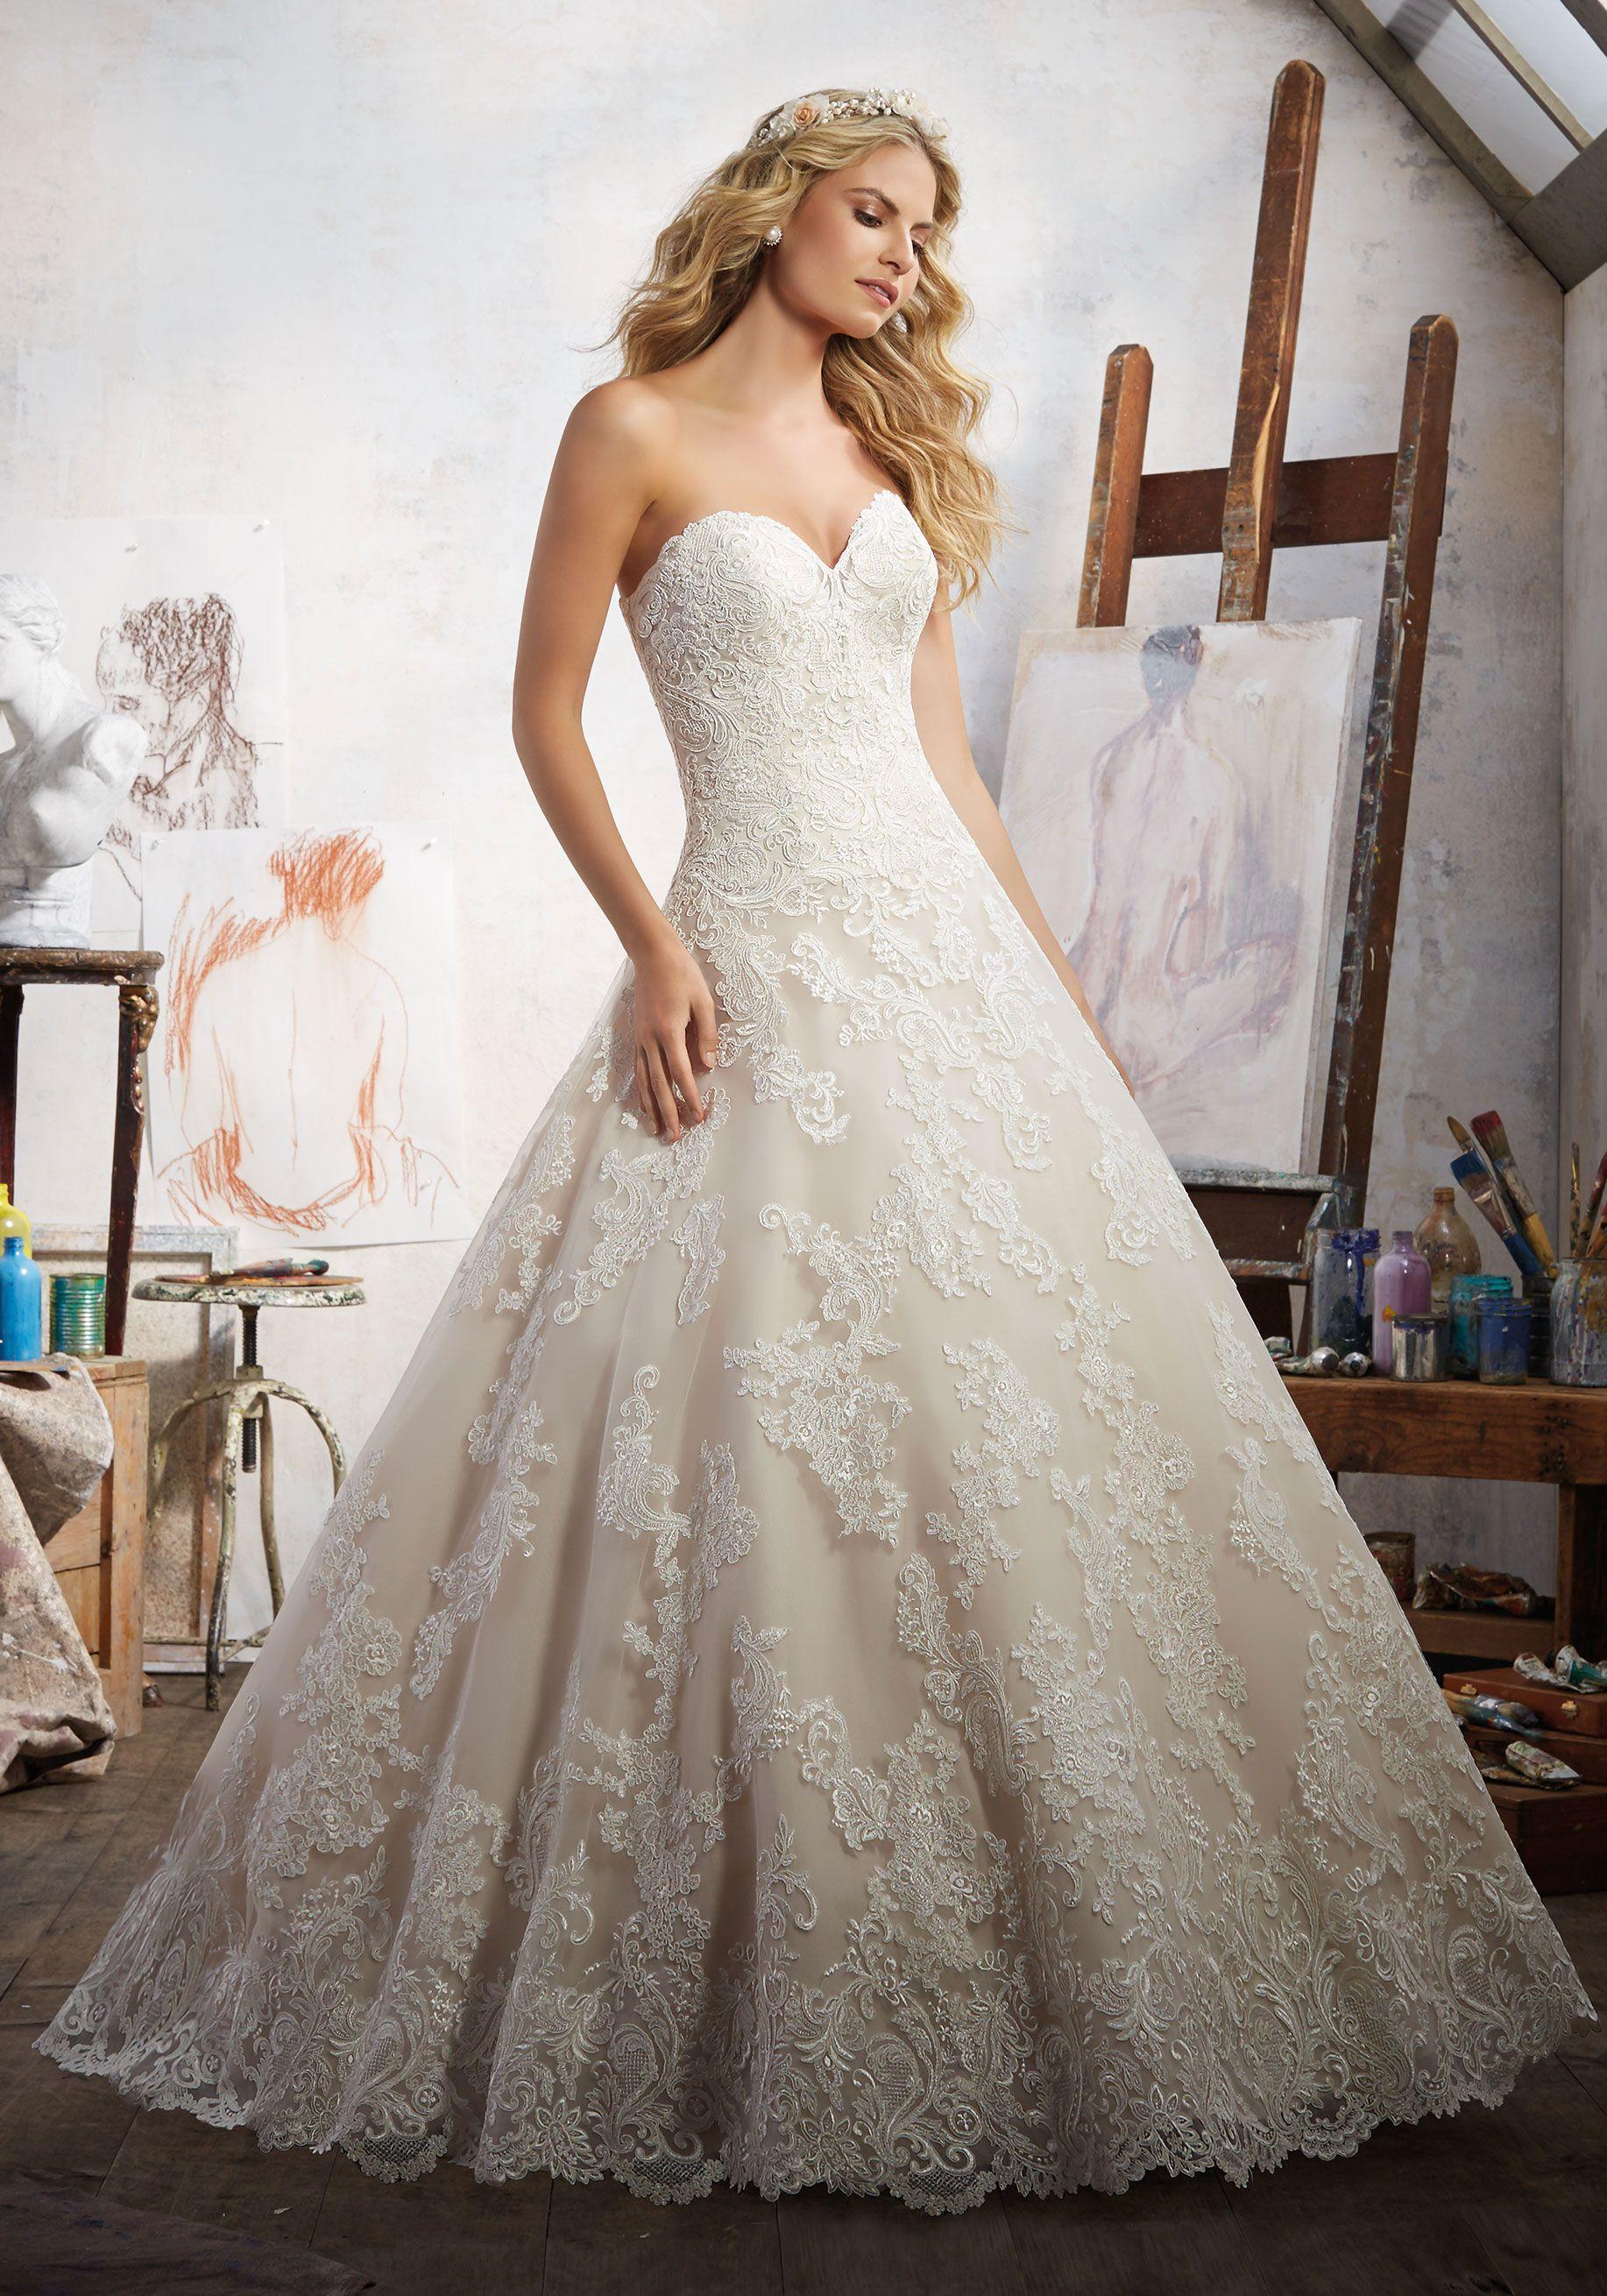 Mori Lee 8108 wedding dress. Colour Ivory. Price £1650